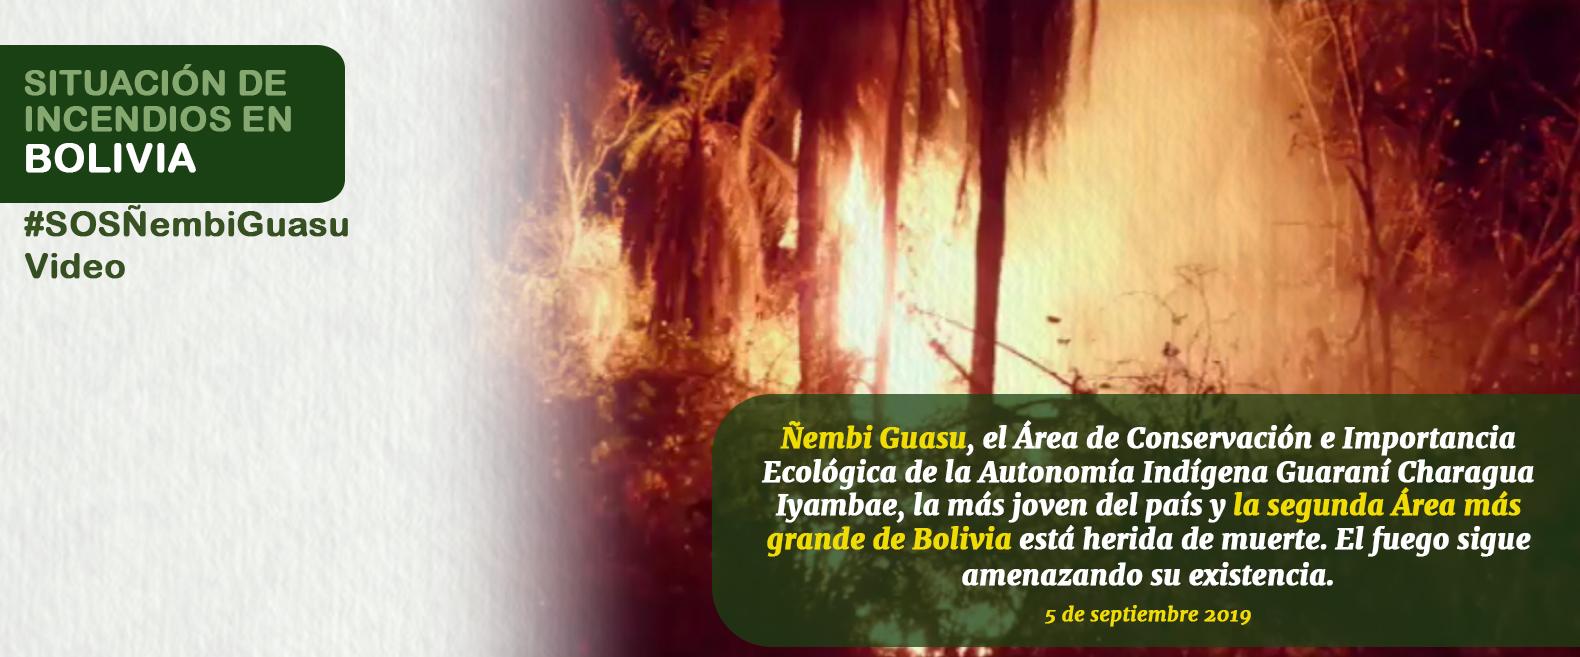 Ñembi Guasu El Gran Refugio Herido de Muerte.